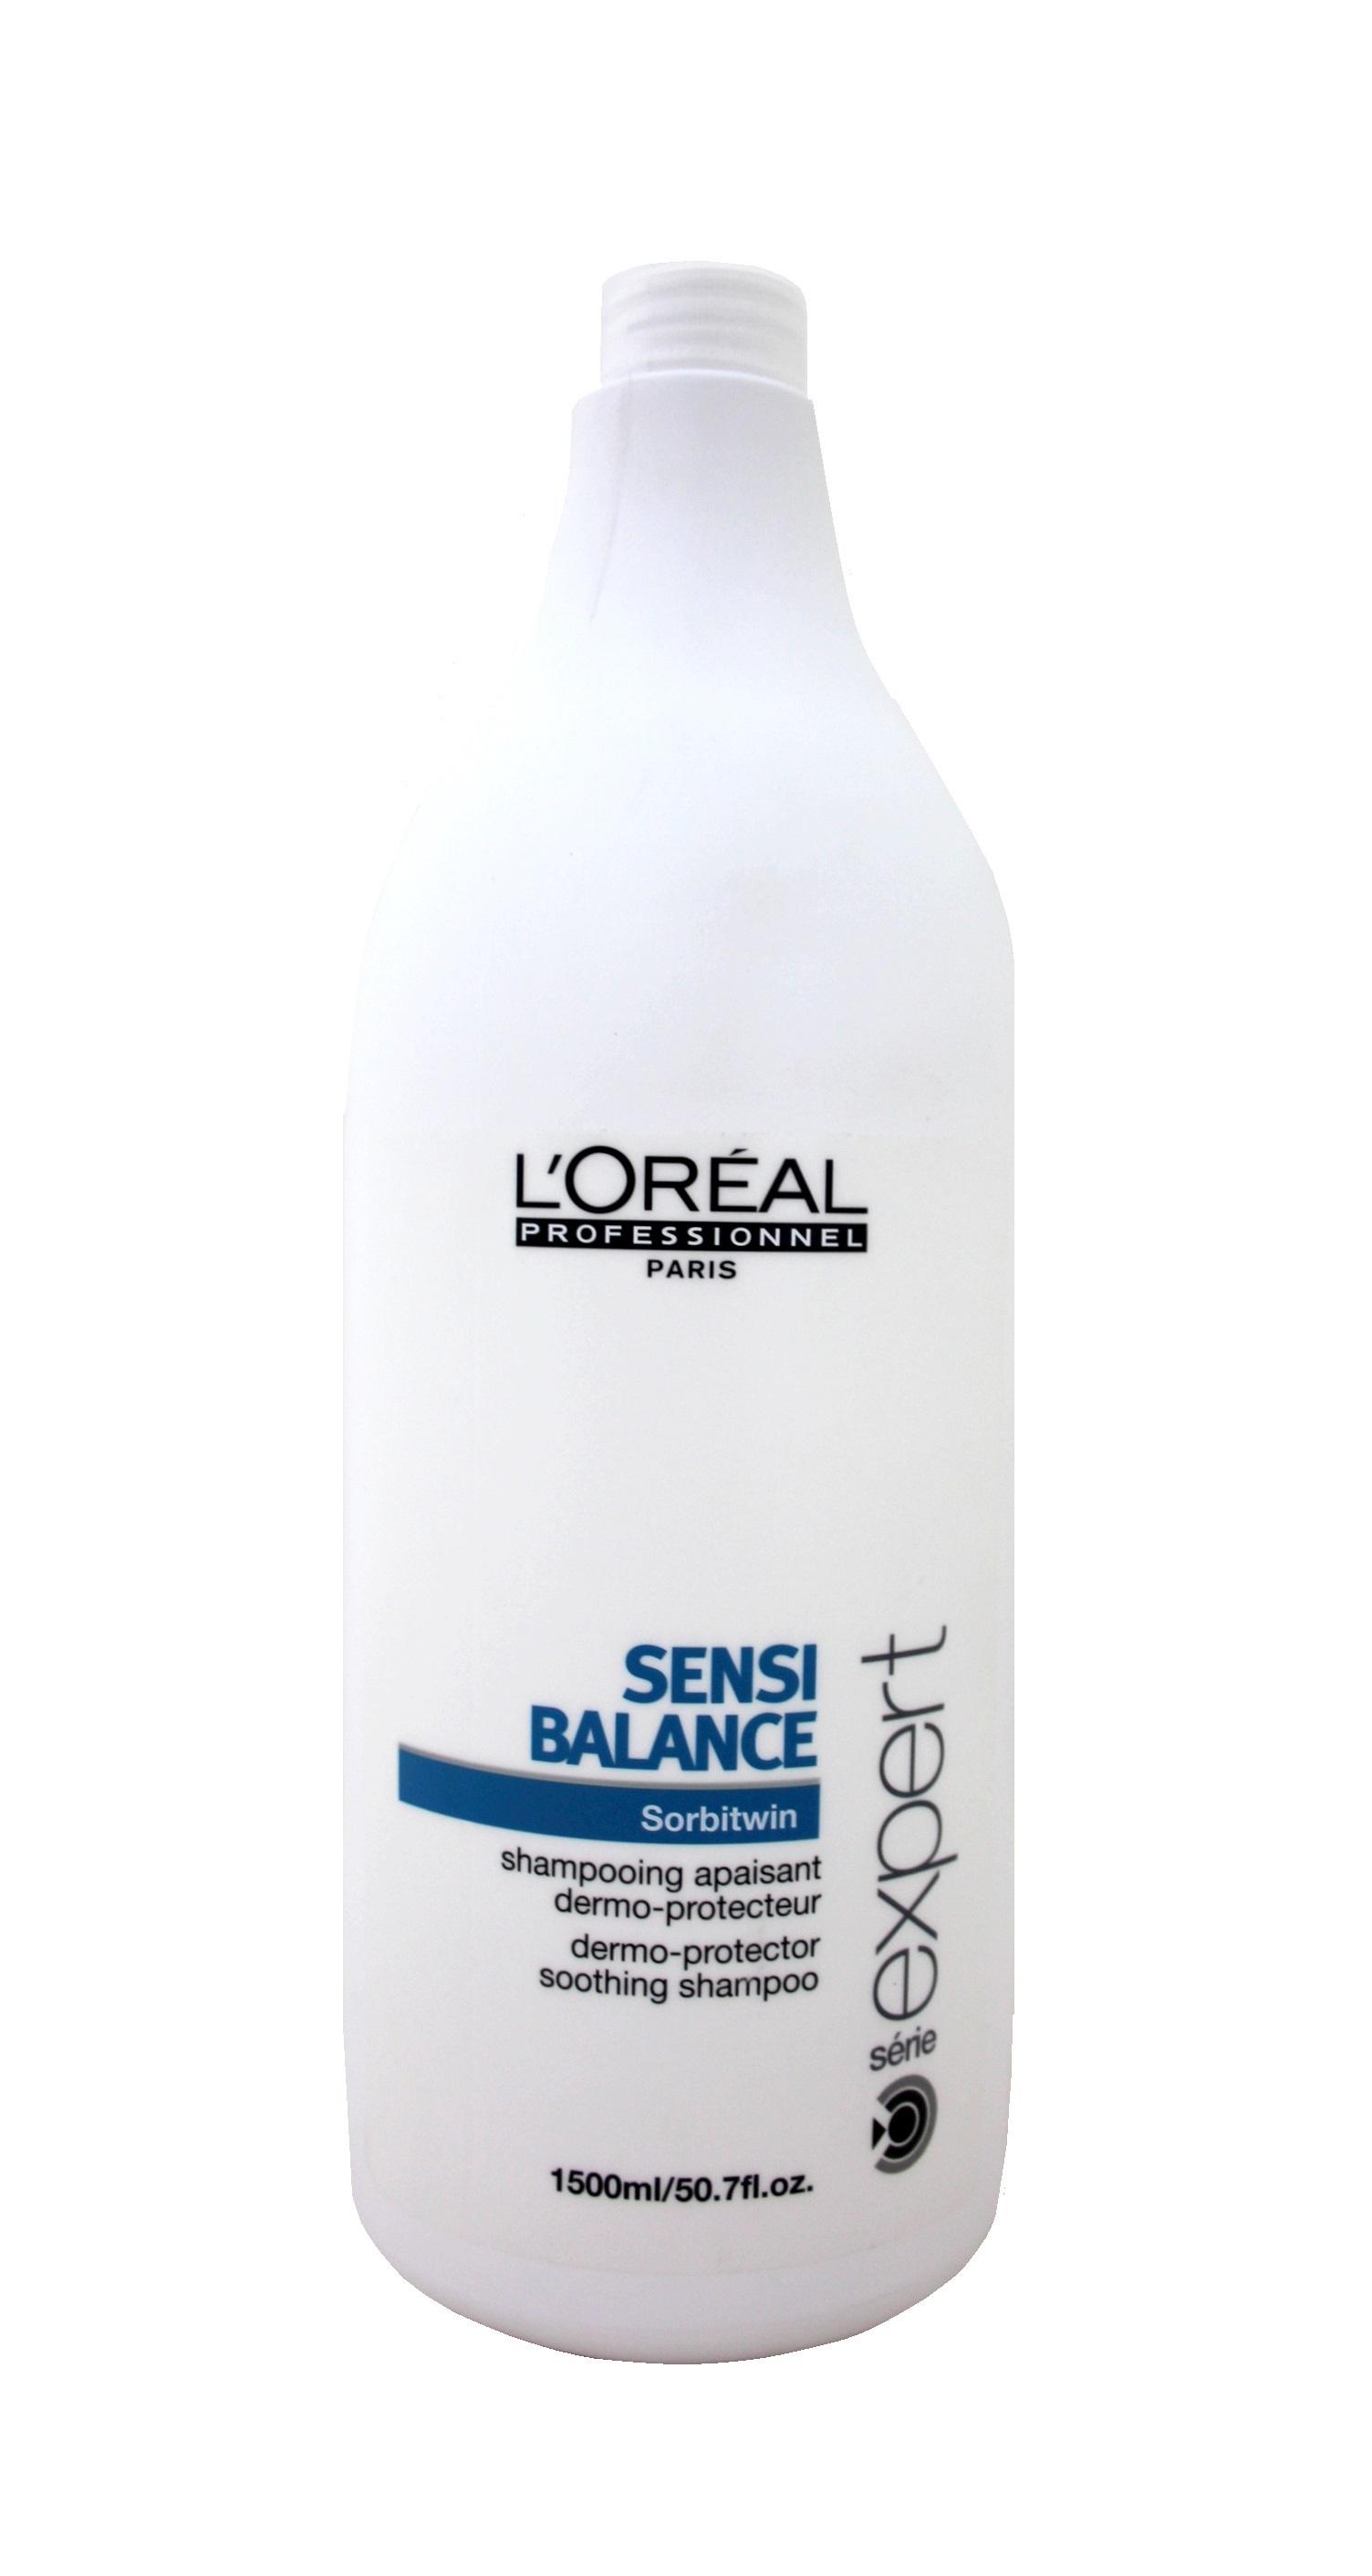 L'Oreal Paris Expert Sensi Balance Shampoo L'Oreal Paris Expert Sensi Balance Shampoo ...